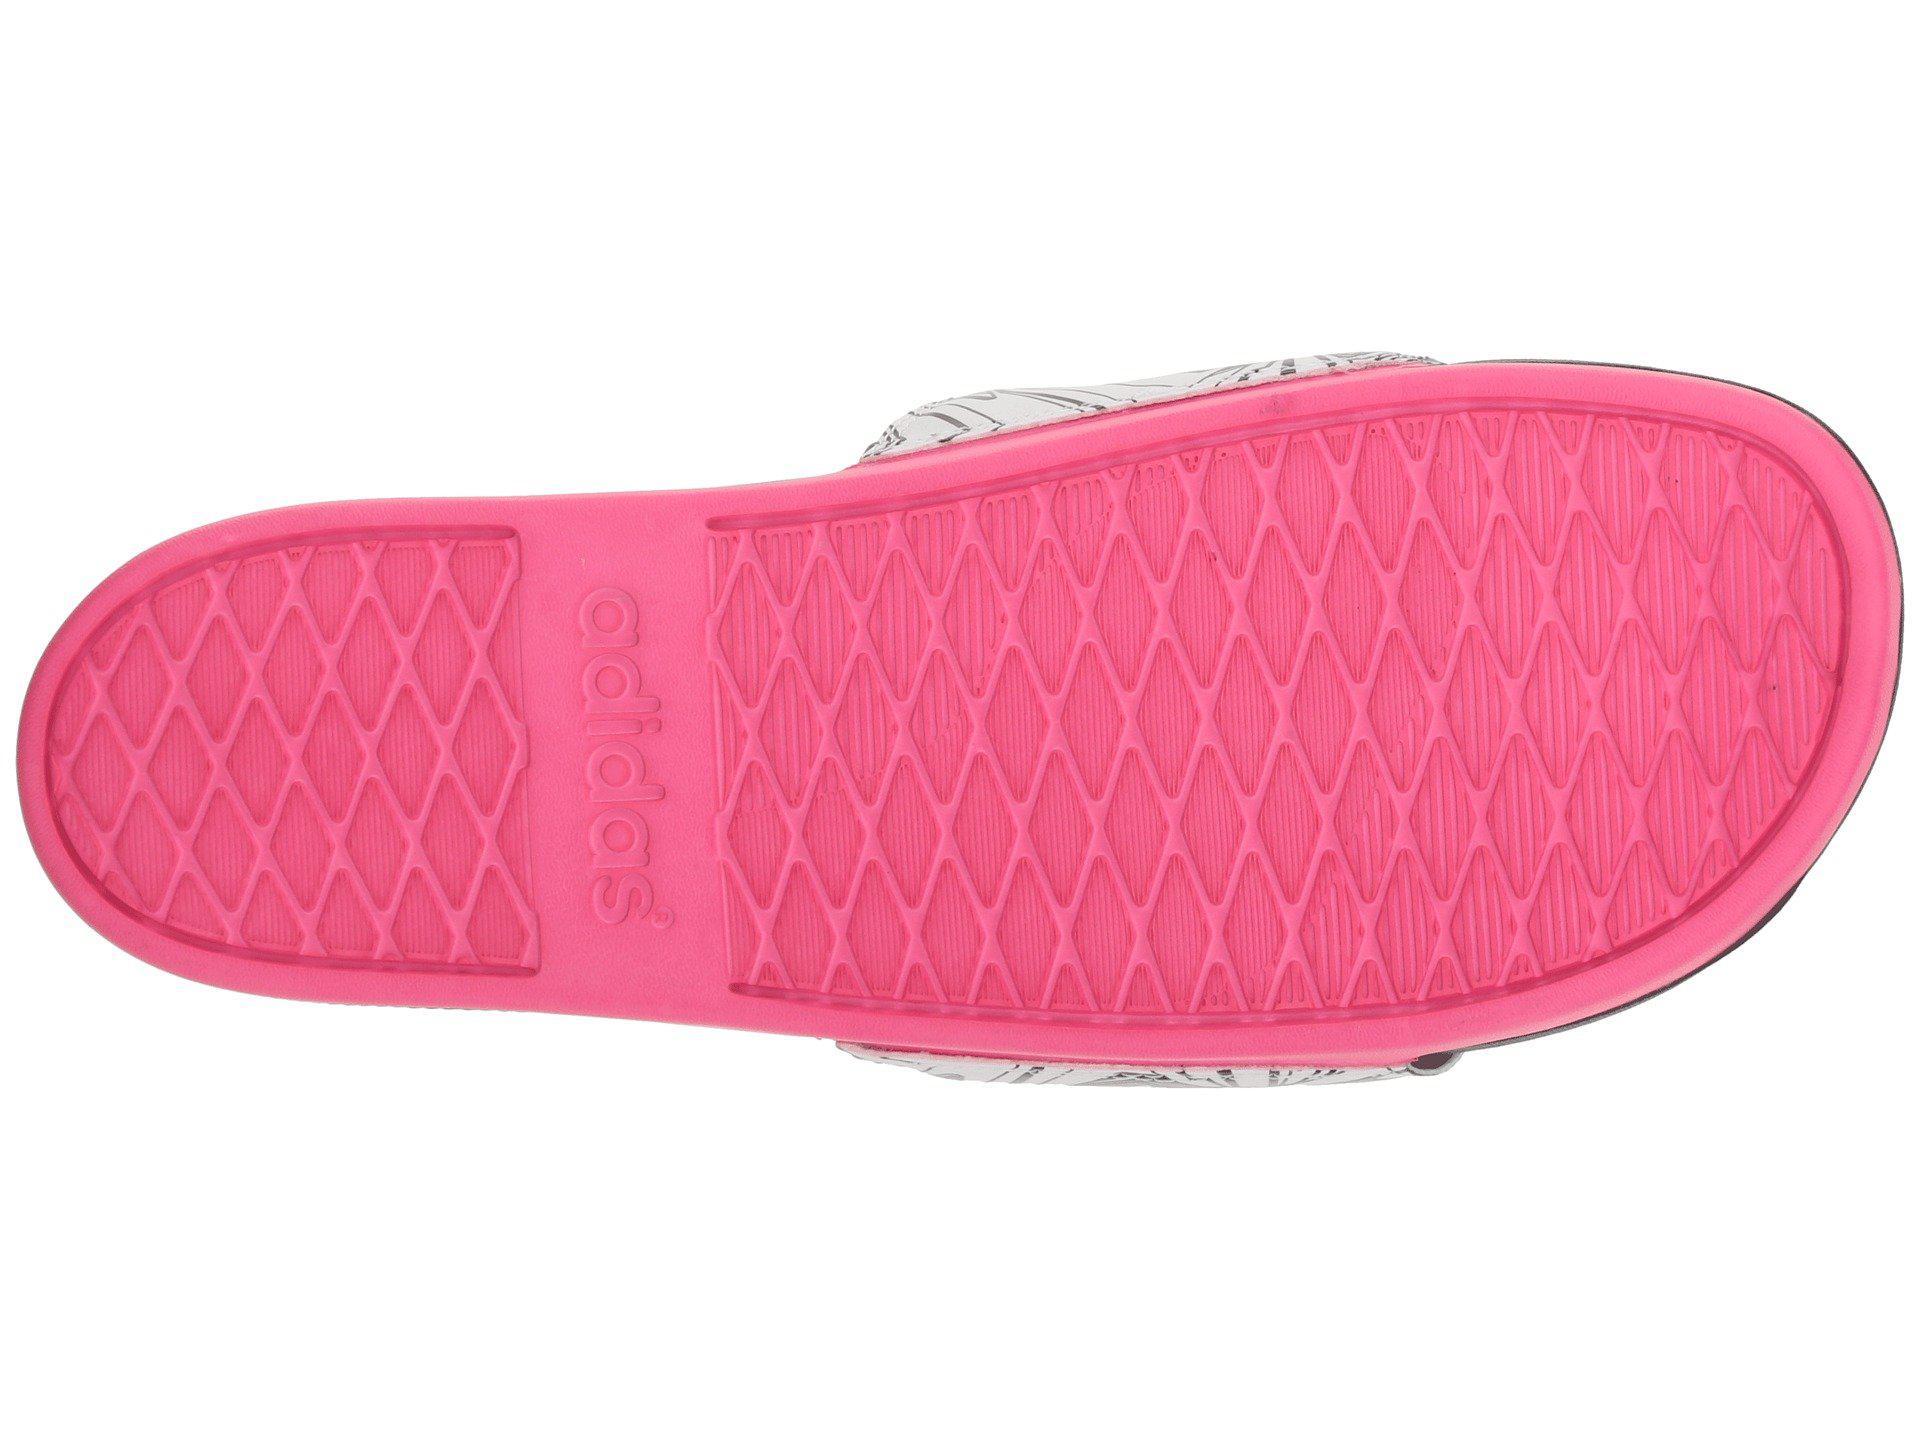 sports shoes 4d6a4 747f5 Adidas - Multicolor Adilette Cf+ Gr - Lyst. View fullscreen